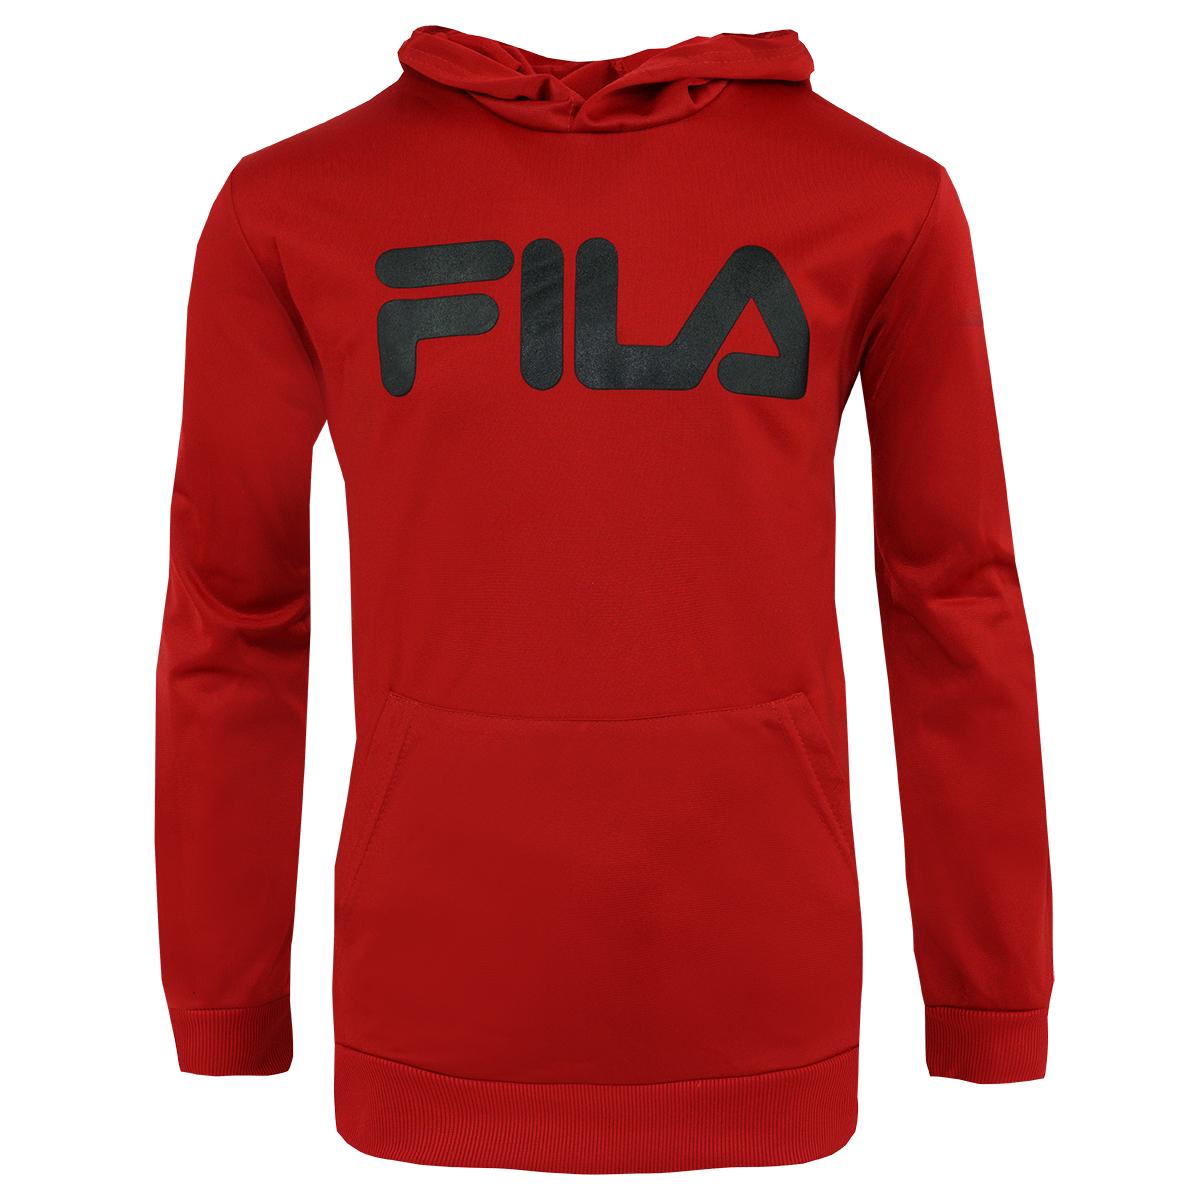 dfbfebb5 Details about Fila Boy's Classic Logo Hoodie Red/Black XL